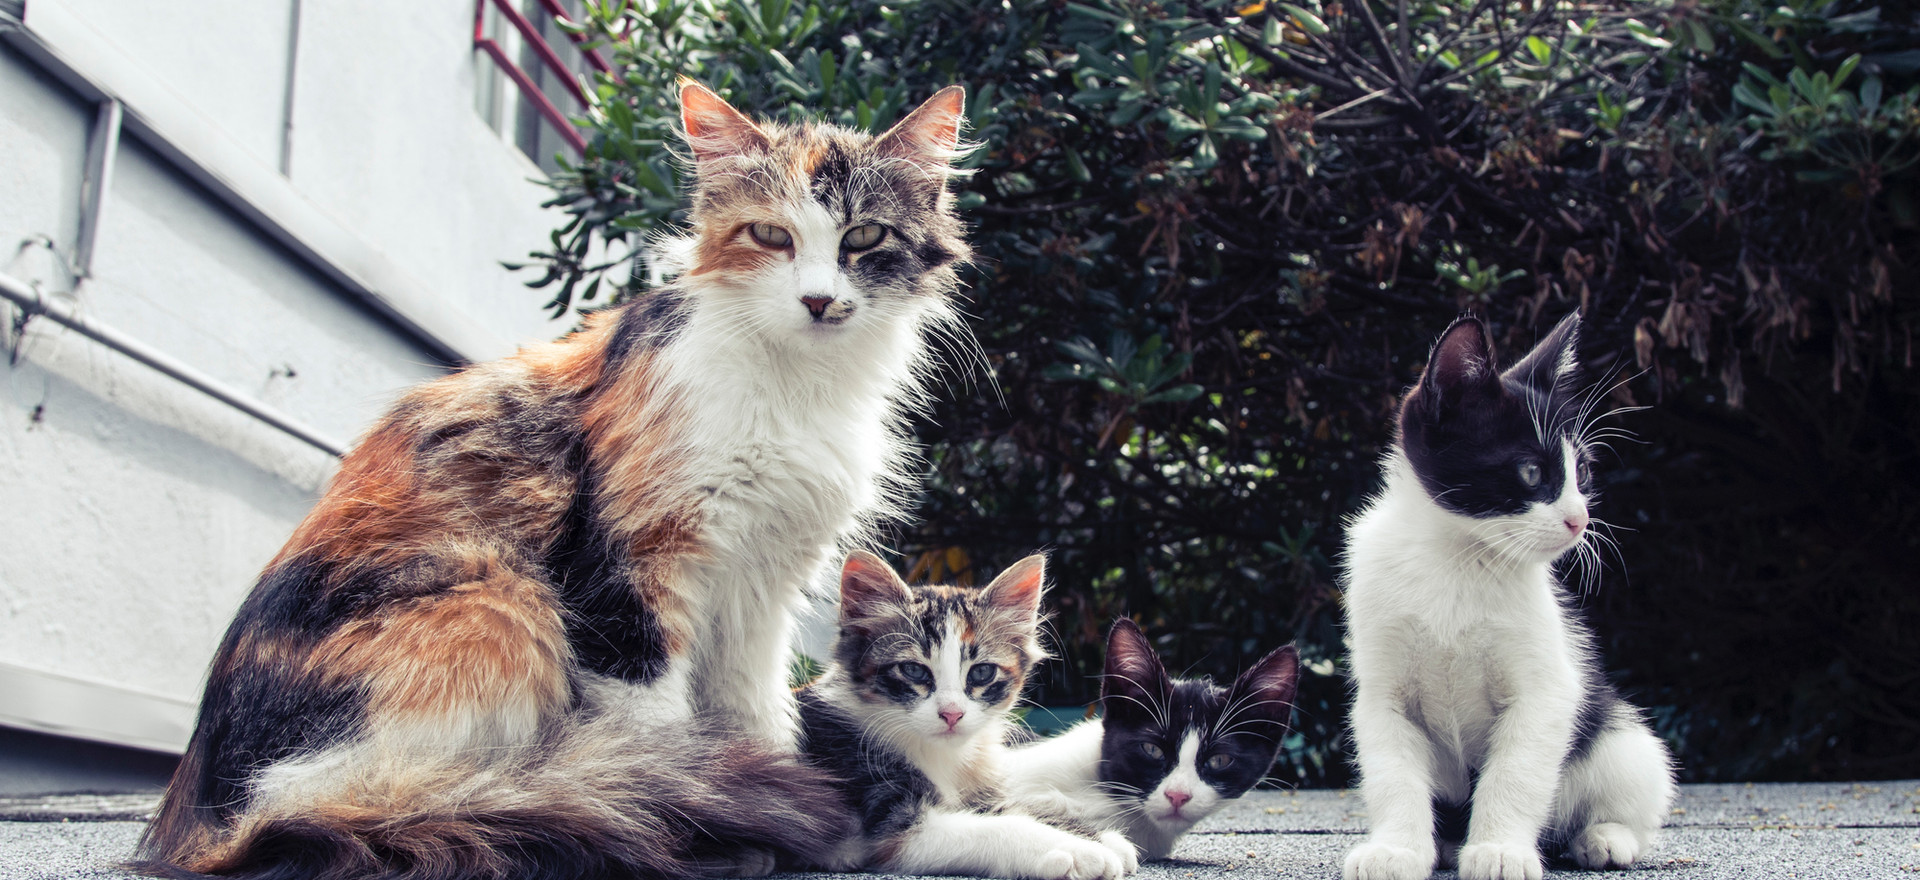 animals-breed-cats-140134.jpg